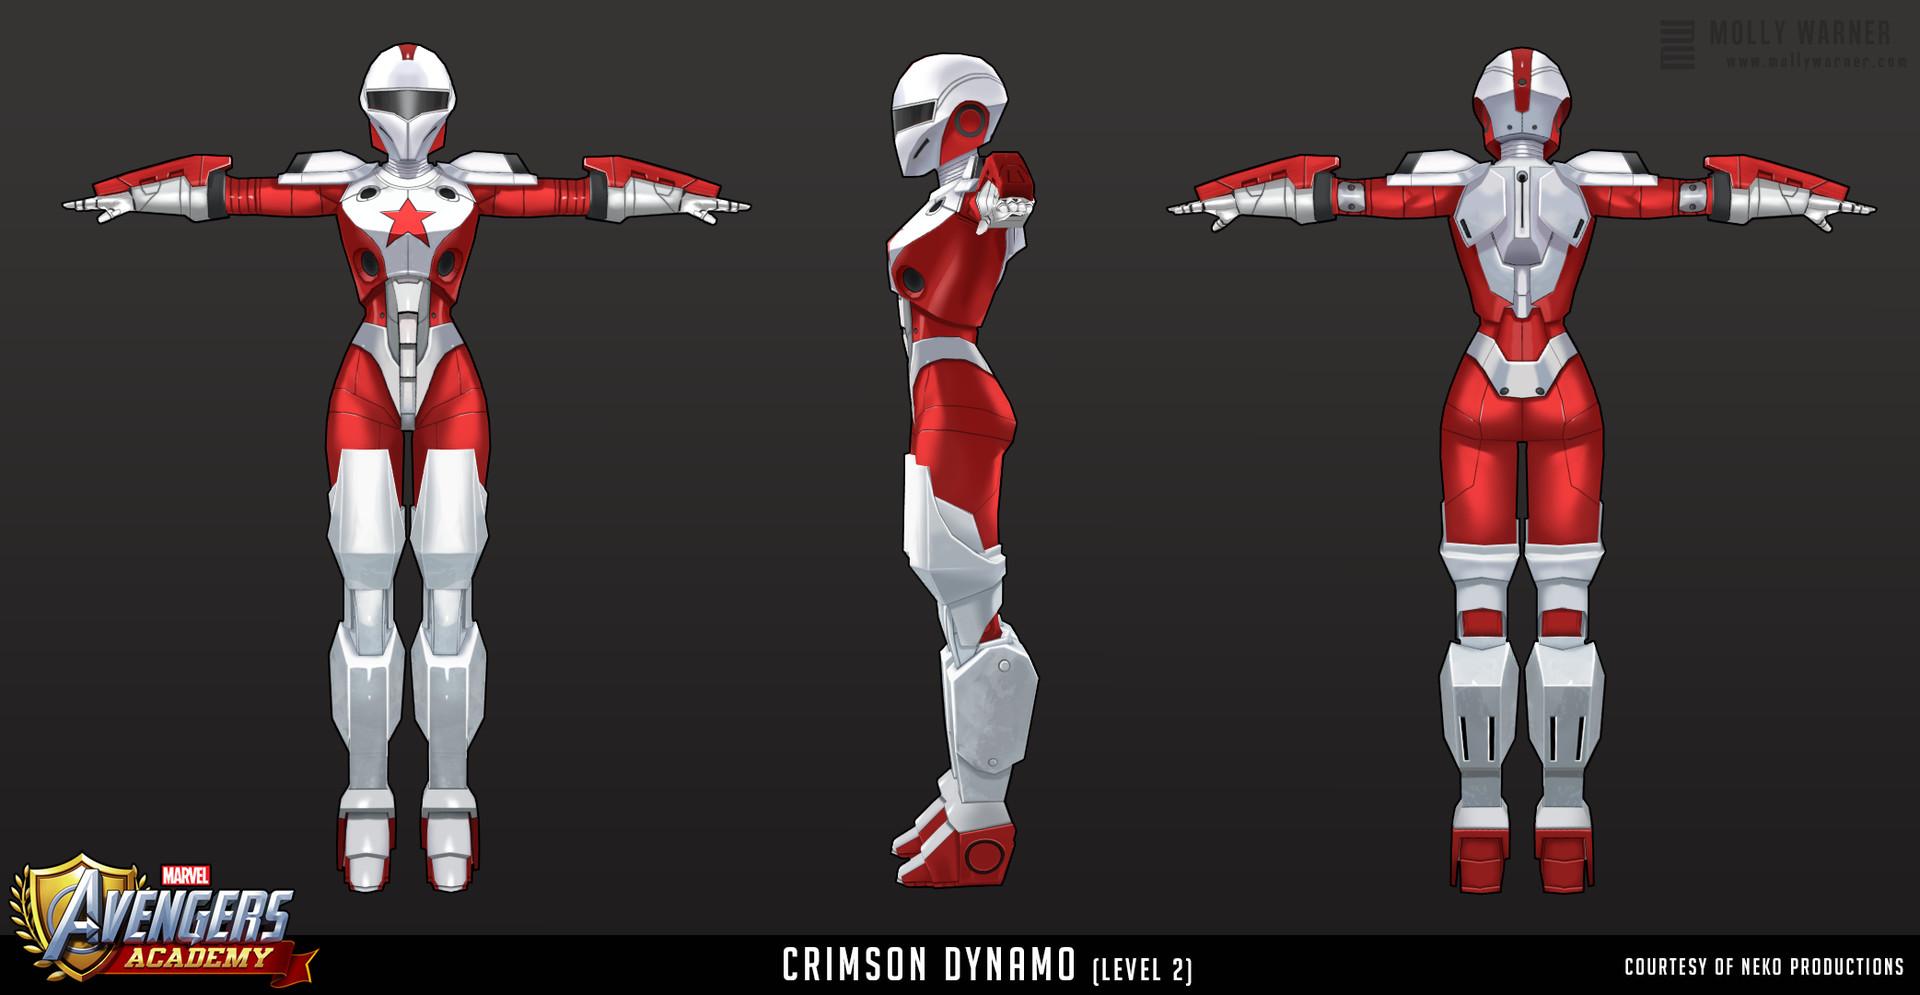 Molly warner 5 avengers academy crimson dynamo l2